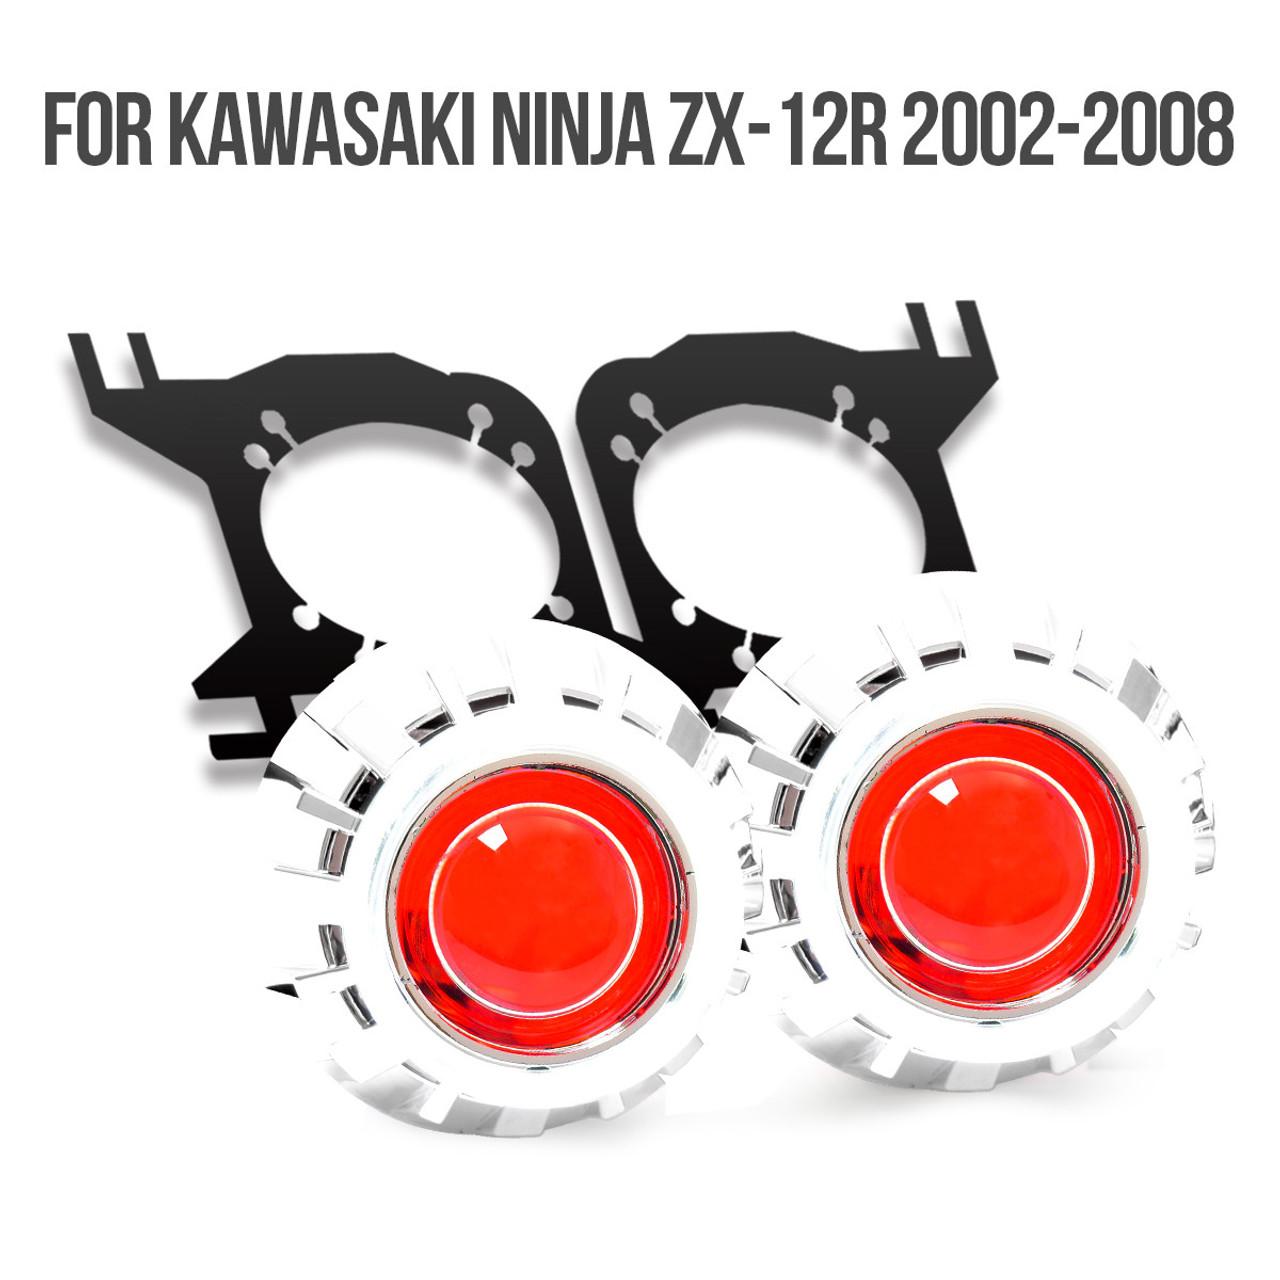 hight resolution of 2002 2003 2004 2005 2006 2007 2008 kawasaki ninja zx12r projector kit